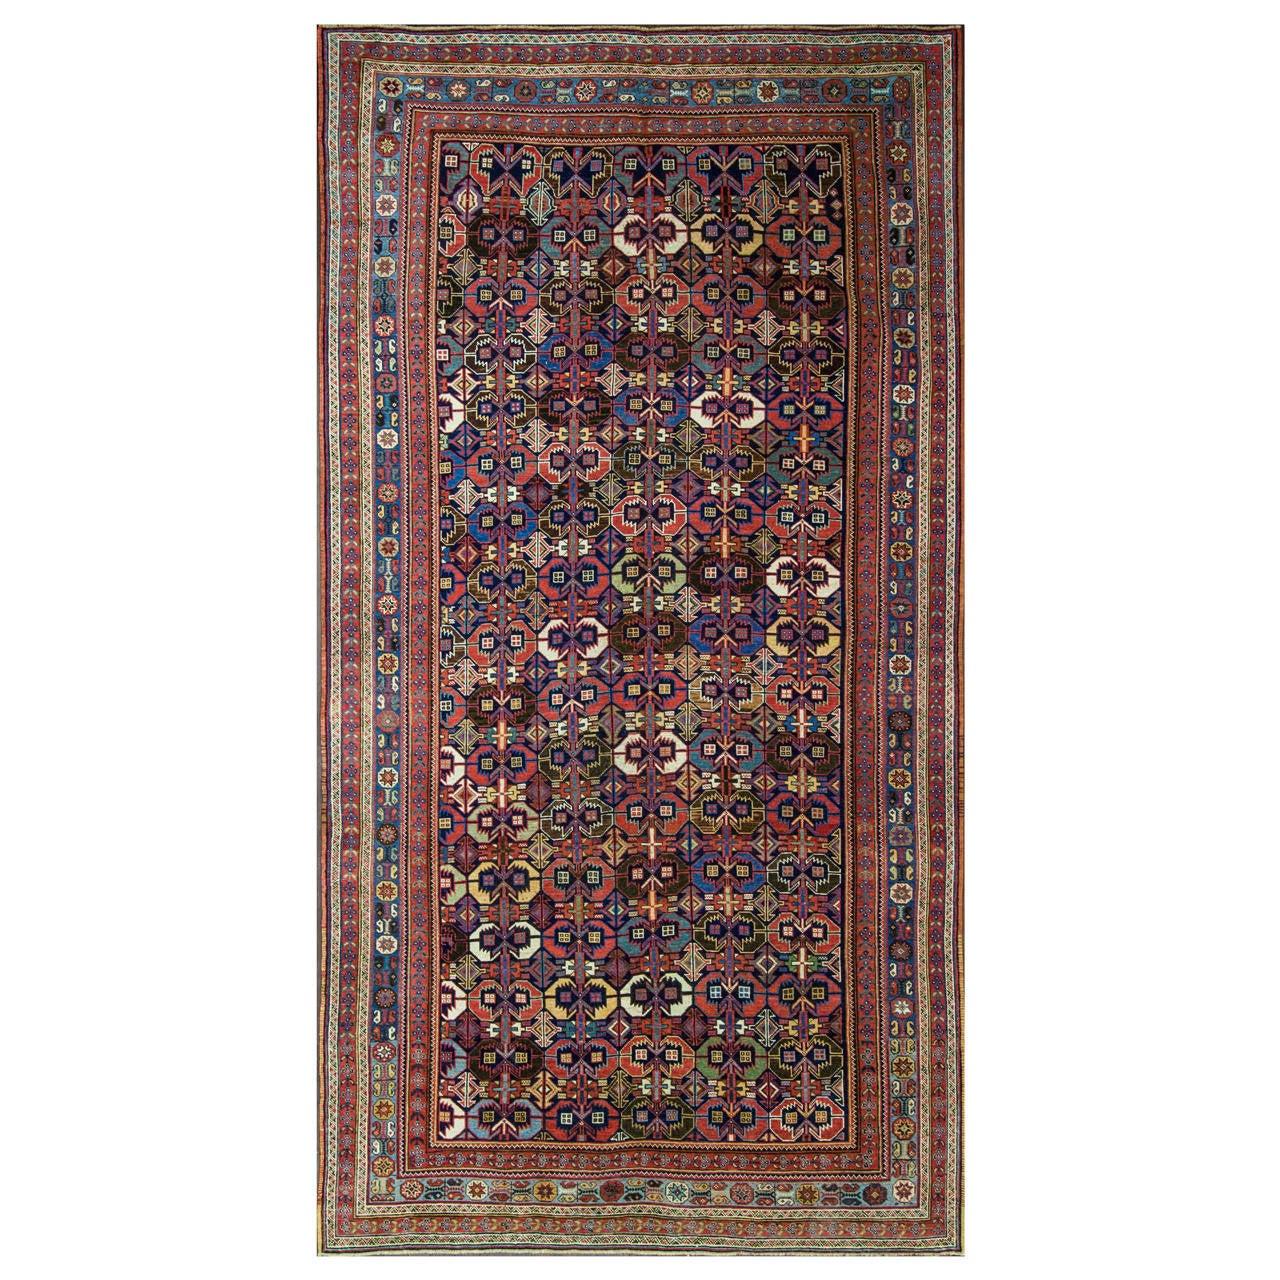 Antique Persian Afshar Carpet